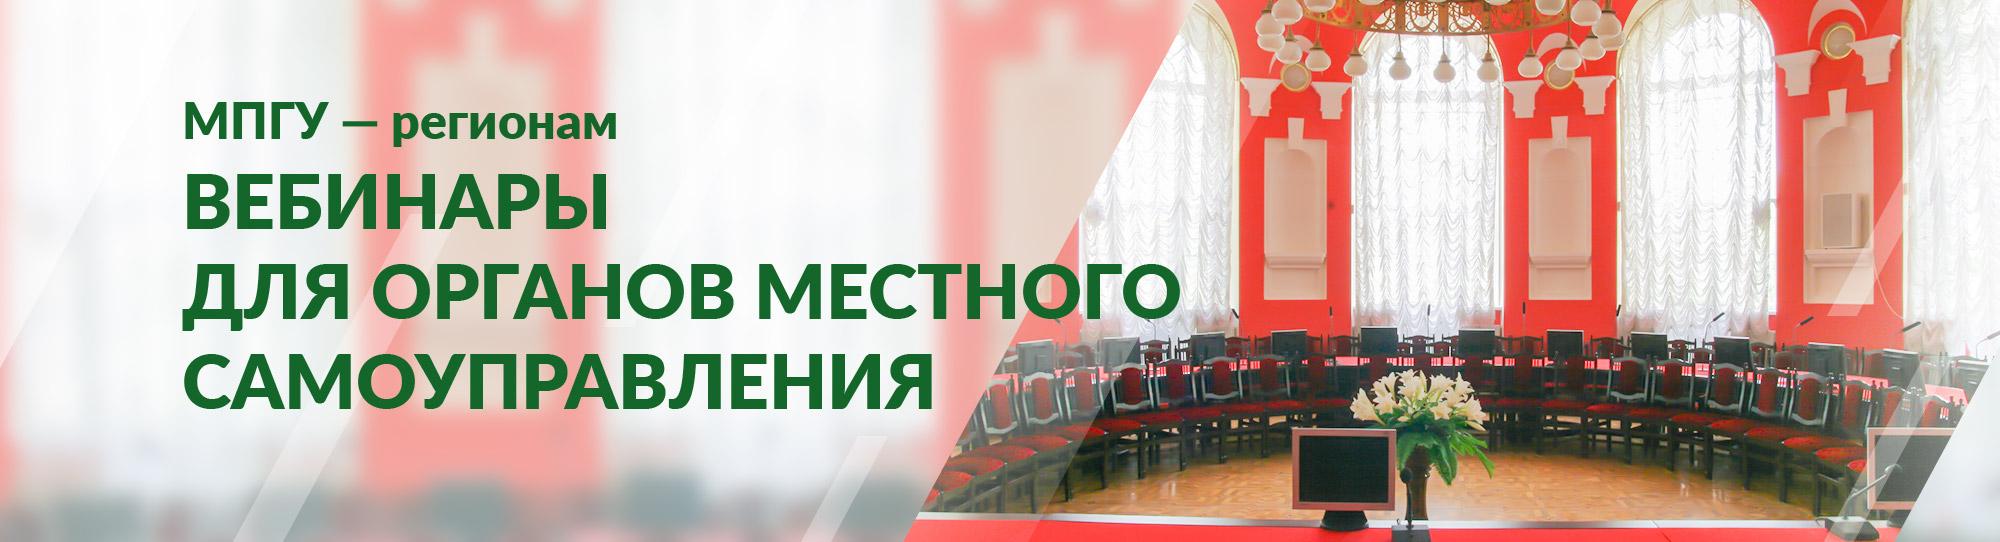 mpgu-site-big-banner-Vebinary2